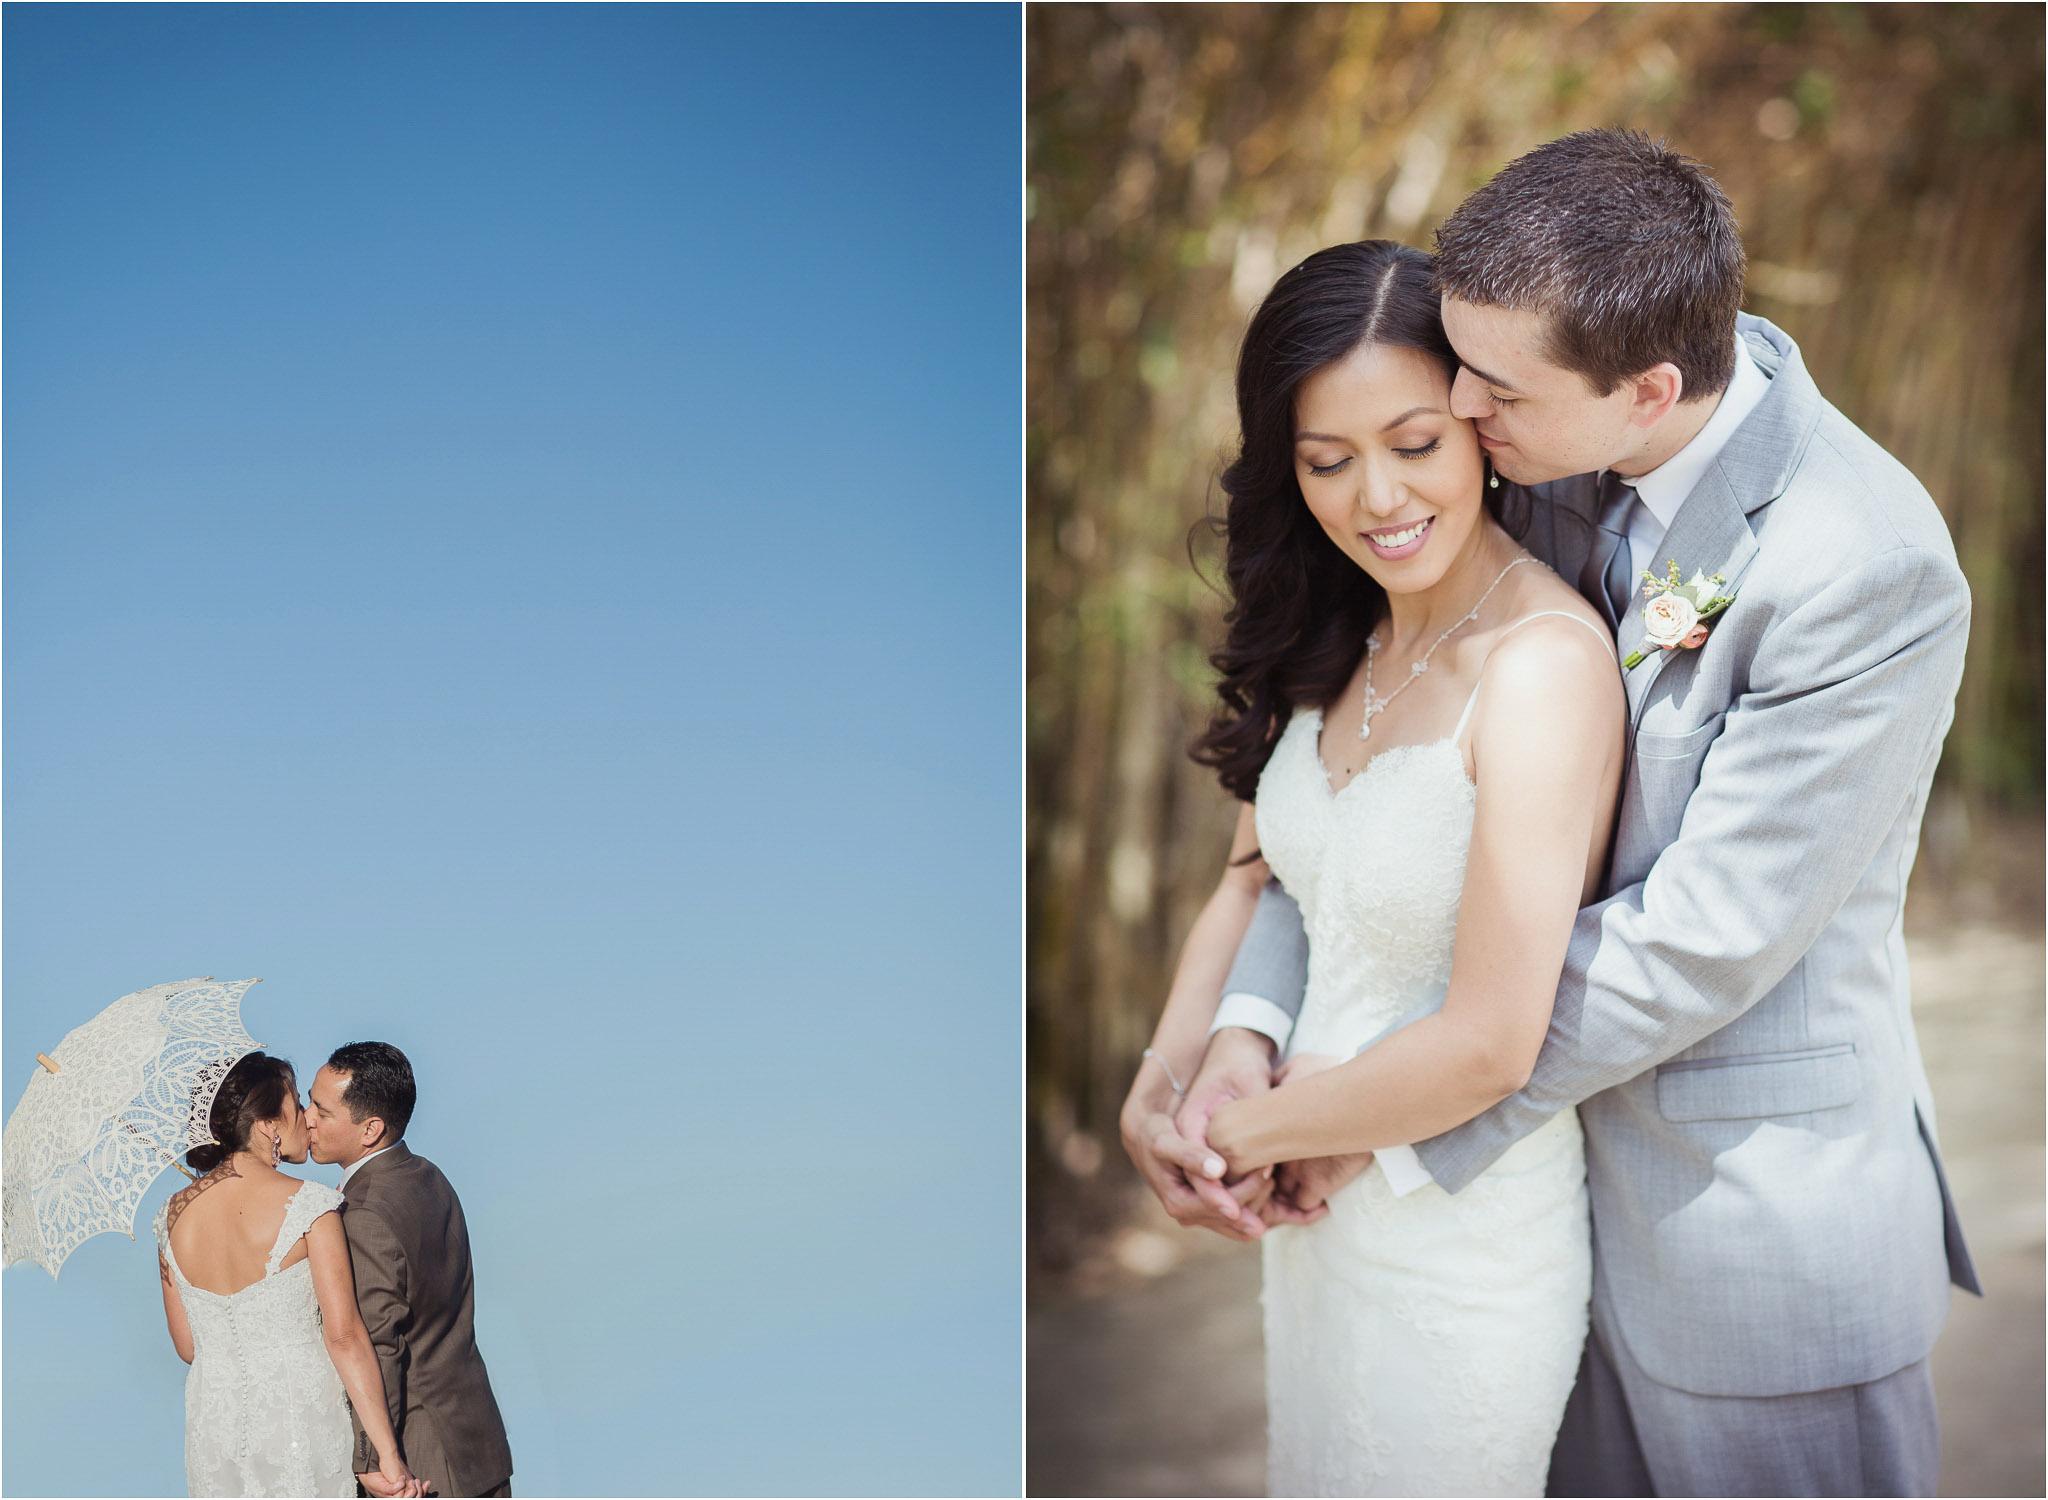 seni seviyorum turkish wedding photographerswedding